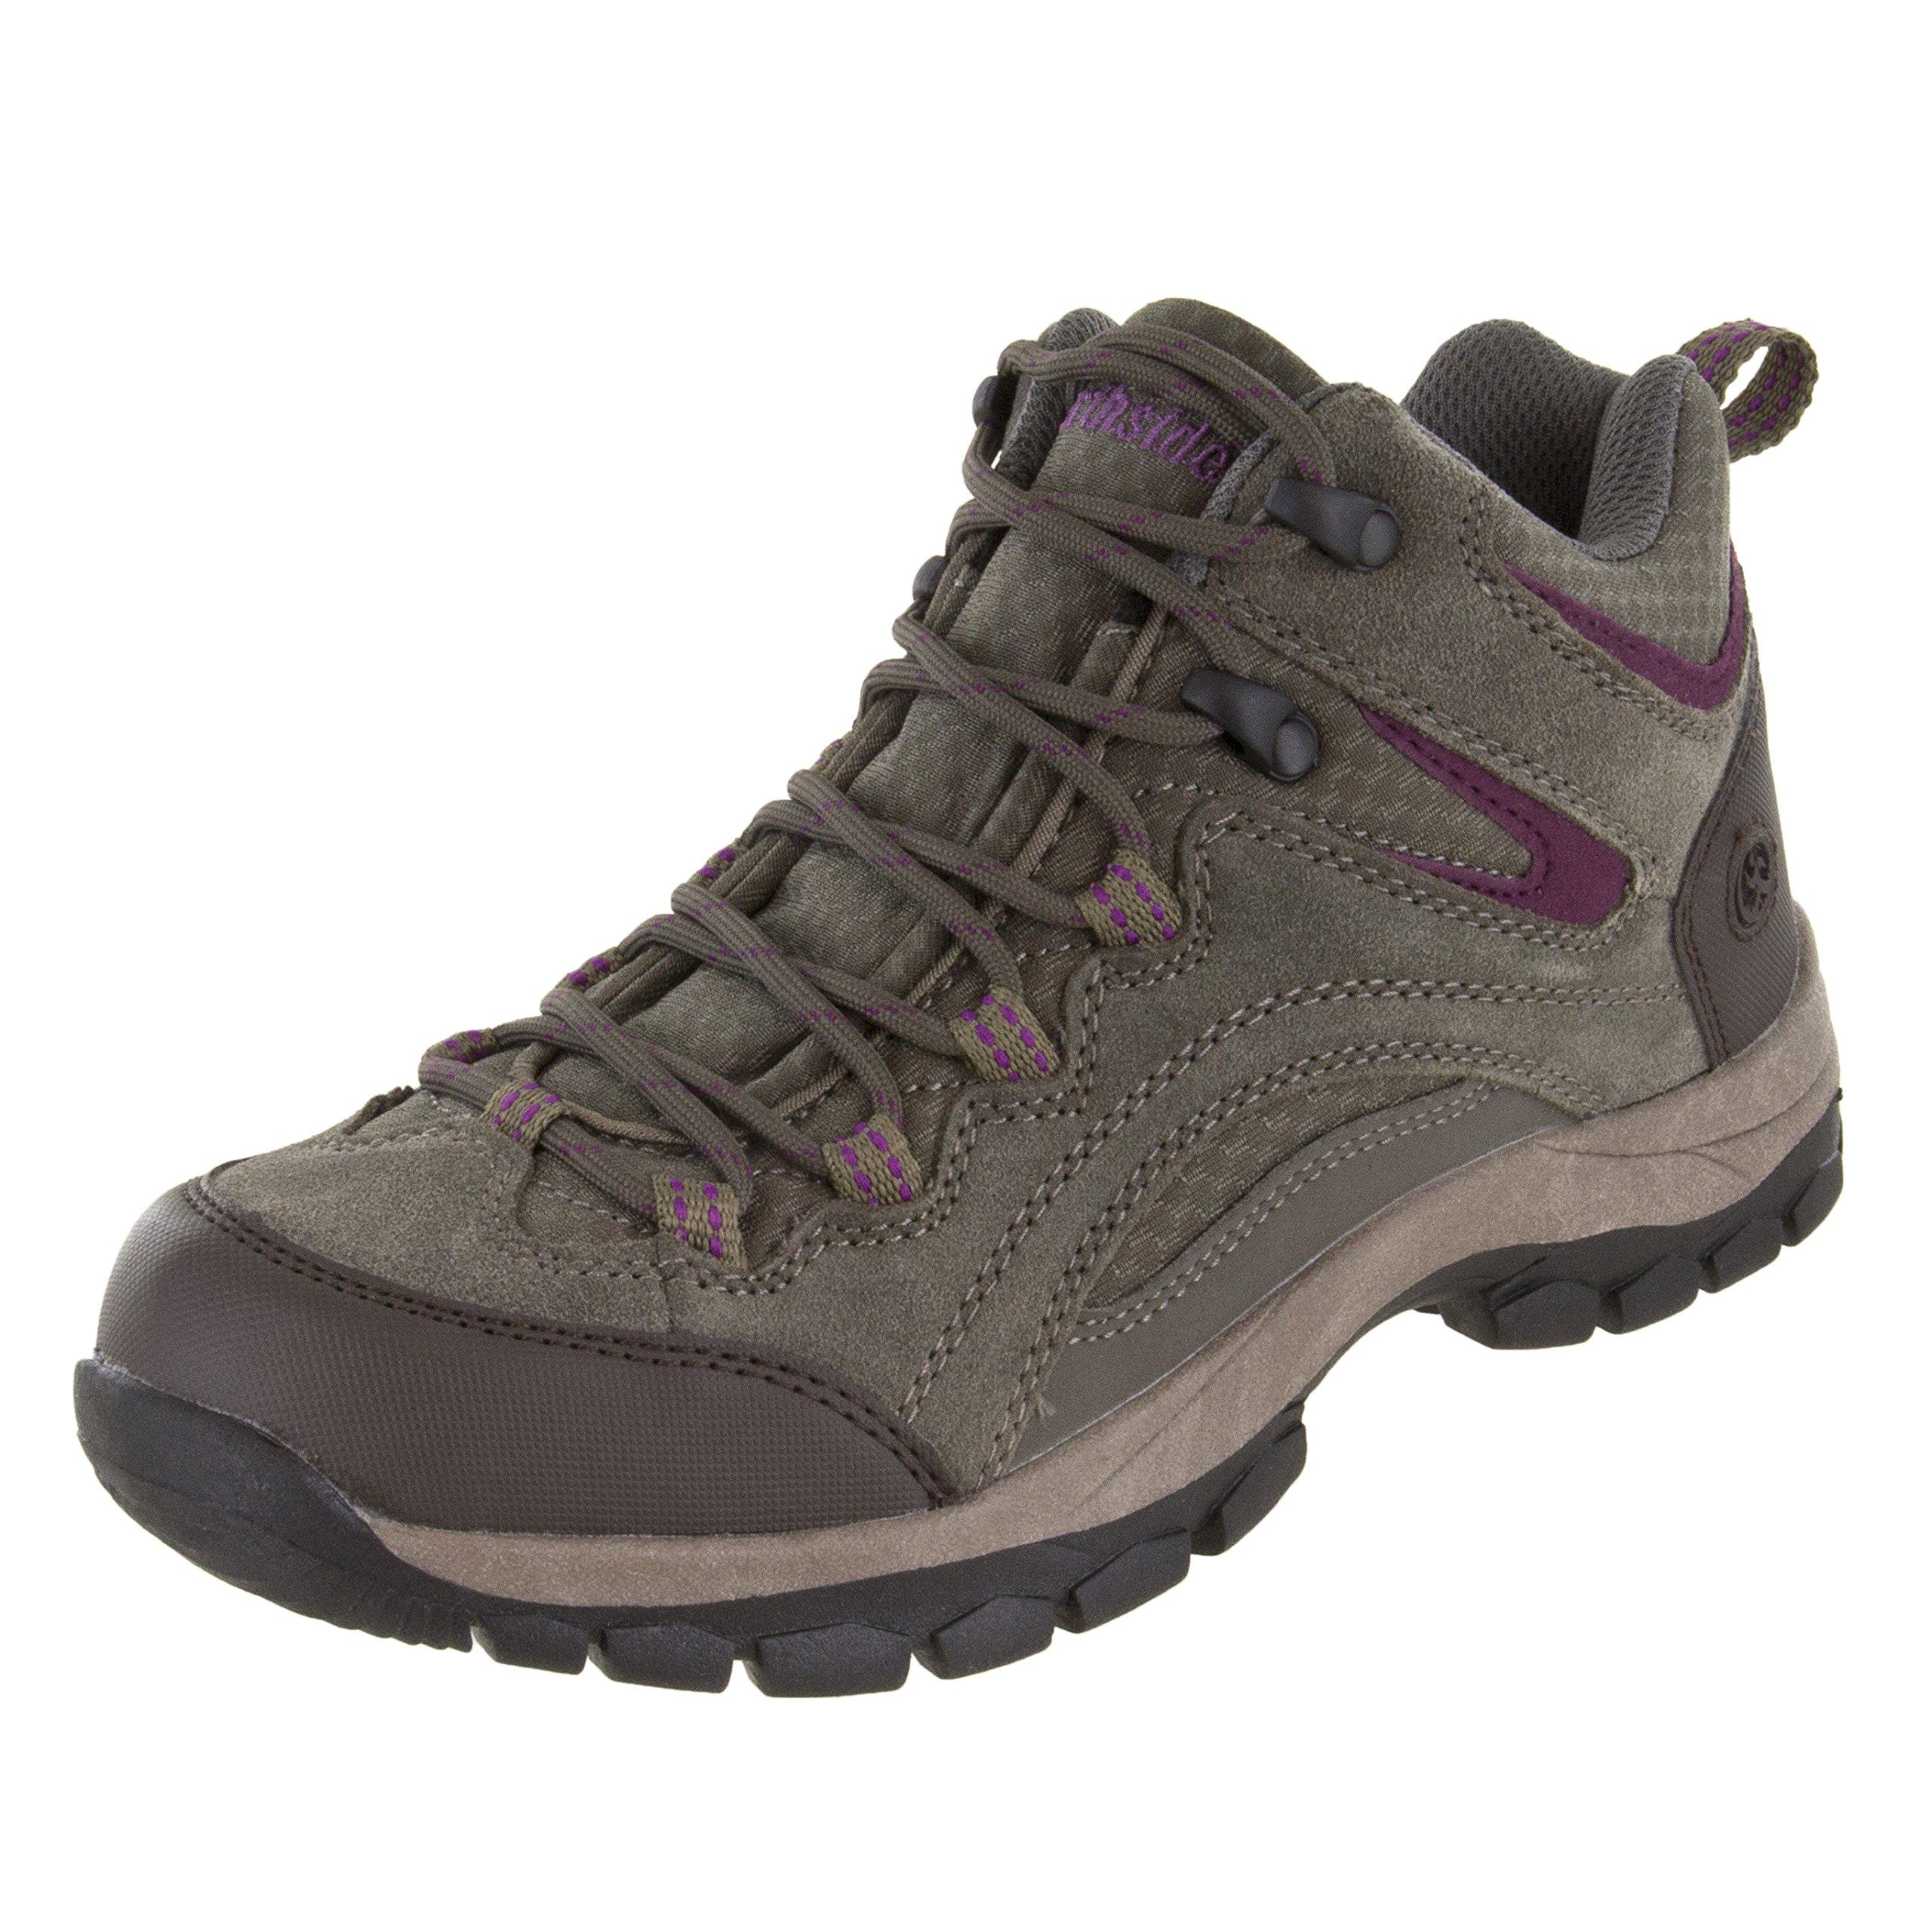 Northside Women's Pioneer Hiking Boot, Stone/Berry, 7.5 B(M) US